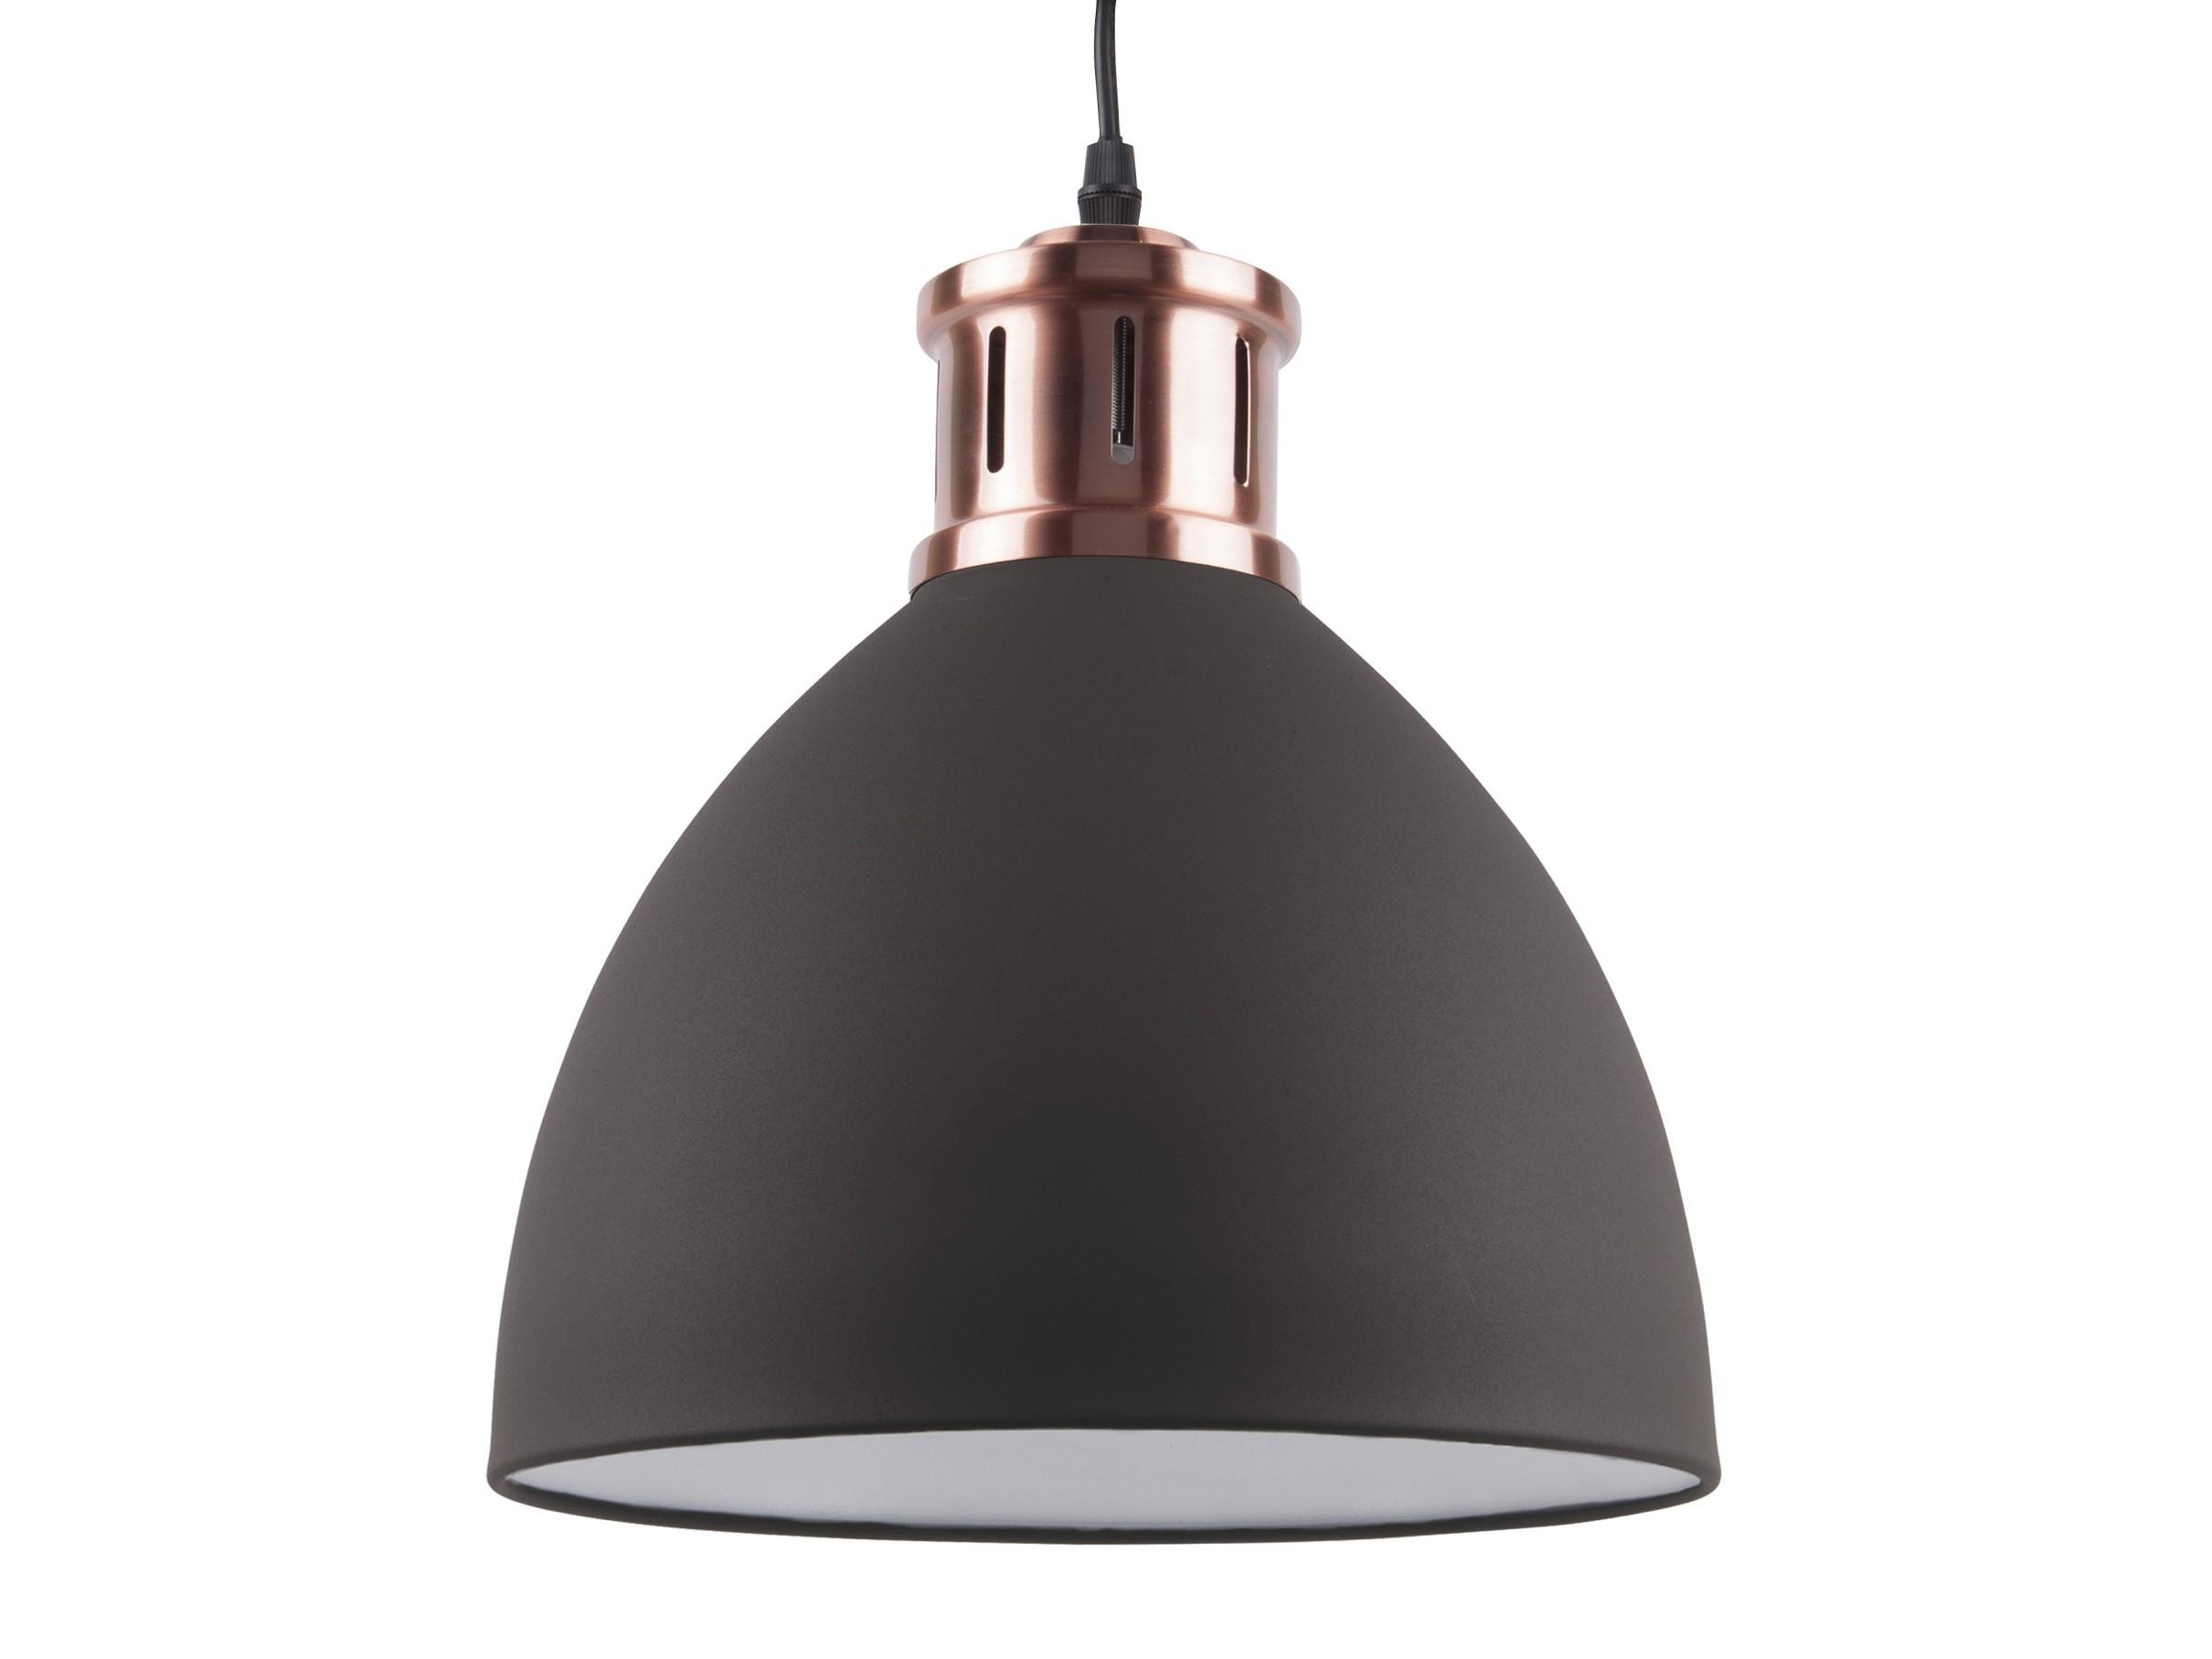 Leitmotiv Hanglamp Refine Zwart-Koper - AllesinWonderland.nl